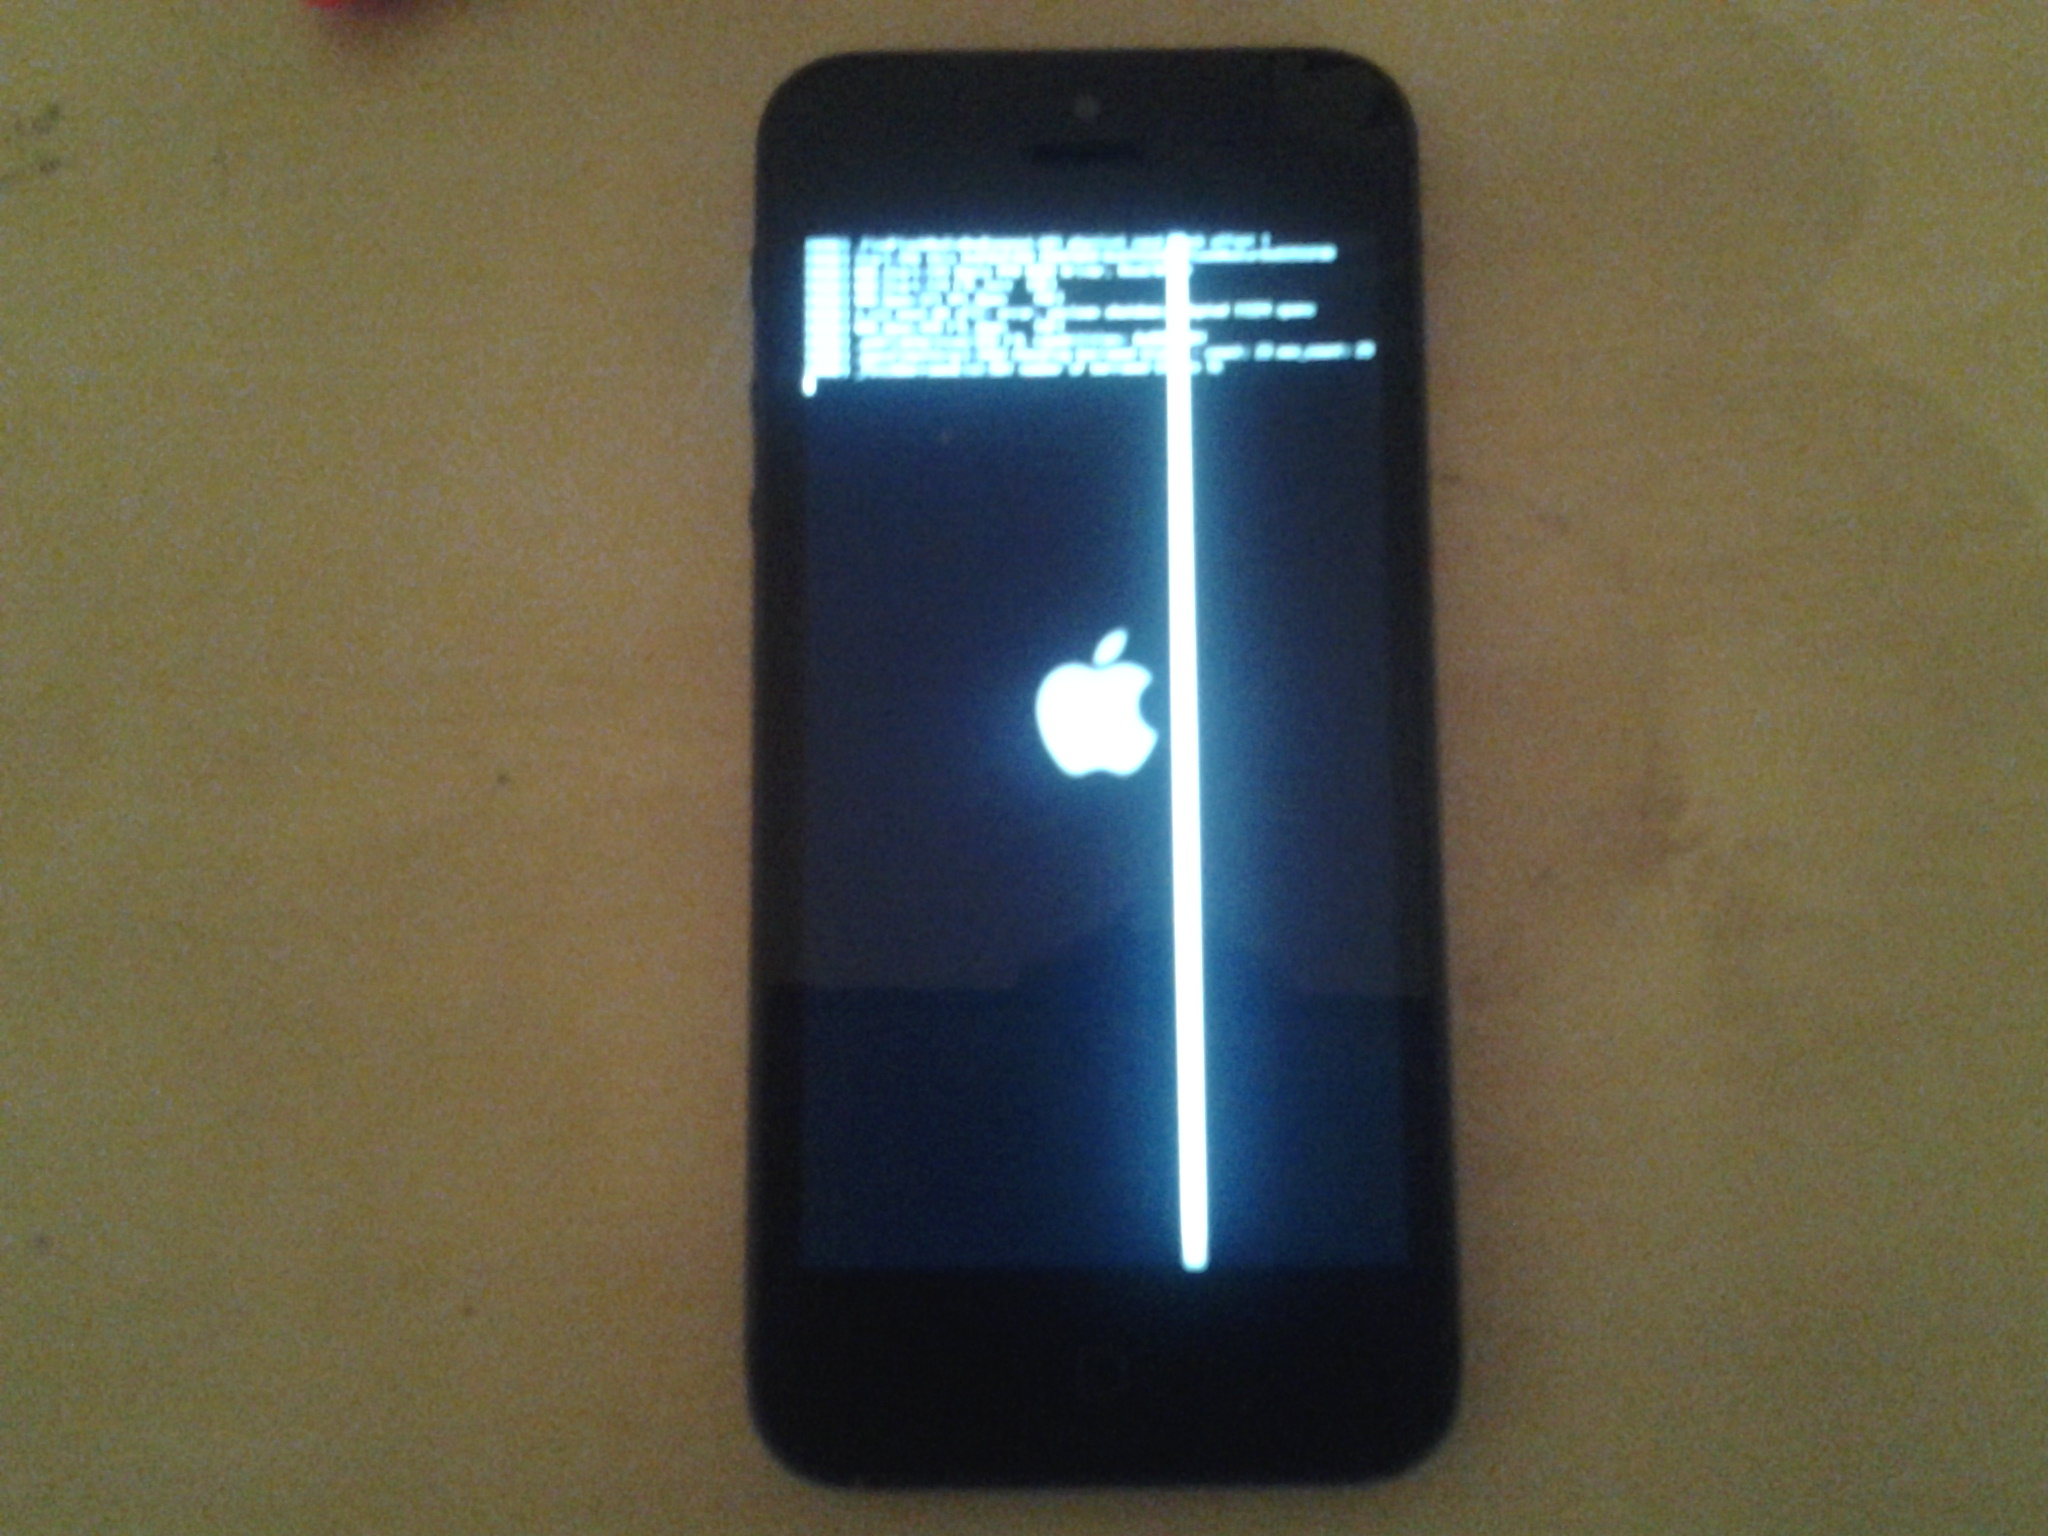 iphone 5 startet nicht apple display boot. Black Bedroom Furniture Sets. Home Design Ideas